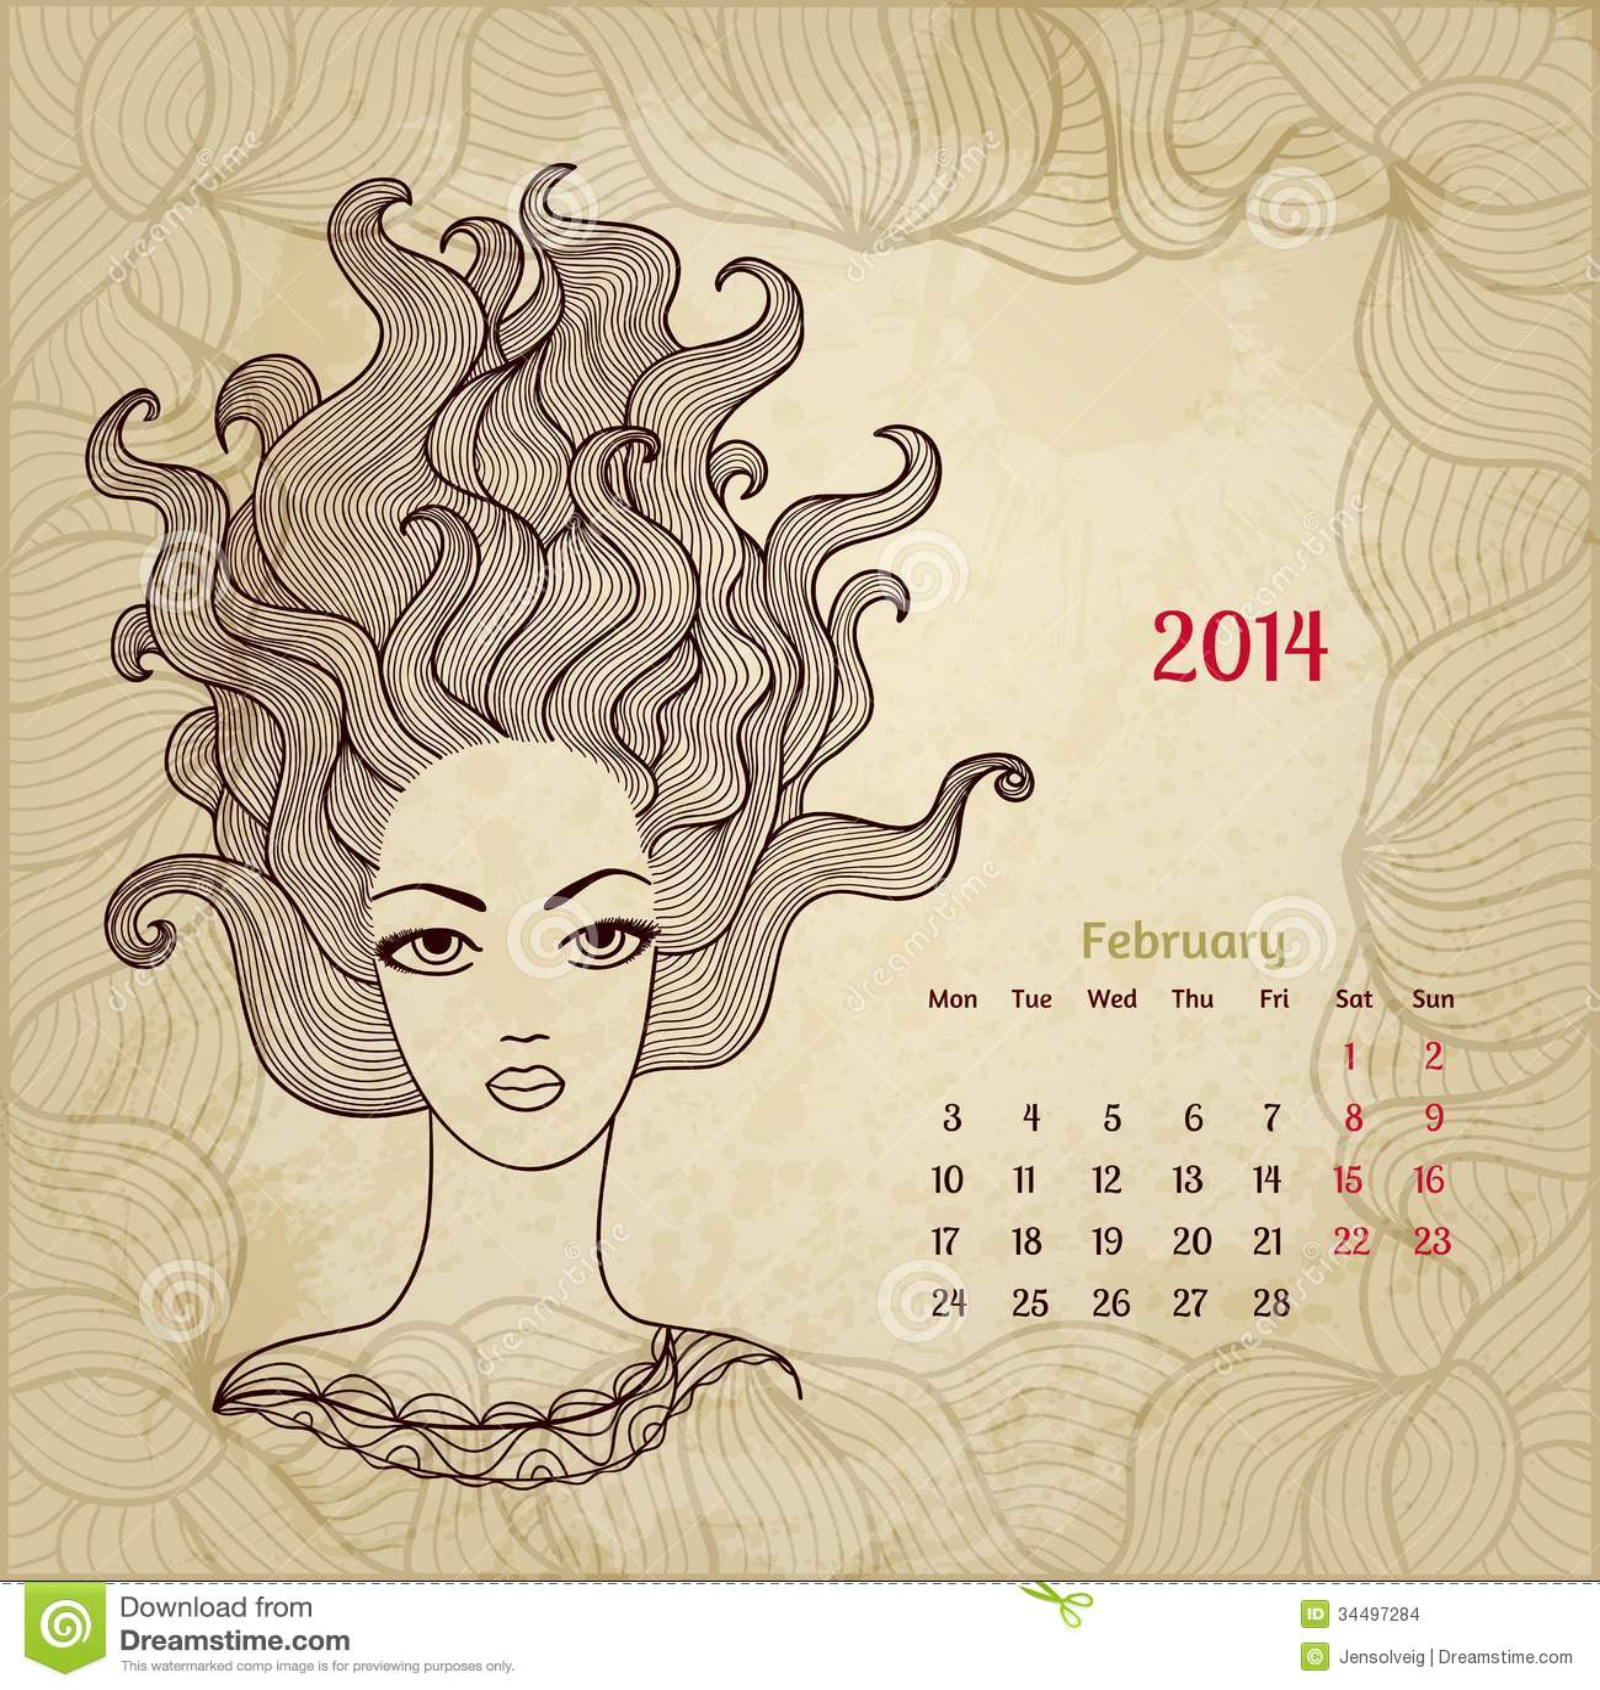 Calendar Artistic : Artistic vintage calendar for february stock images